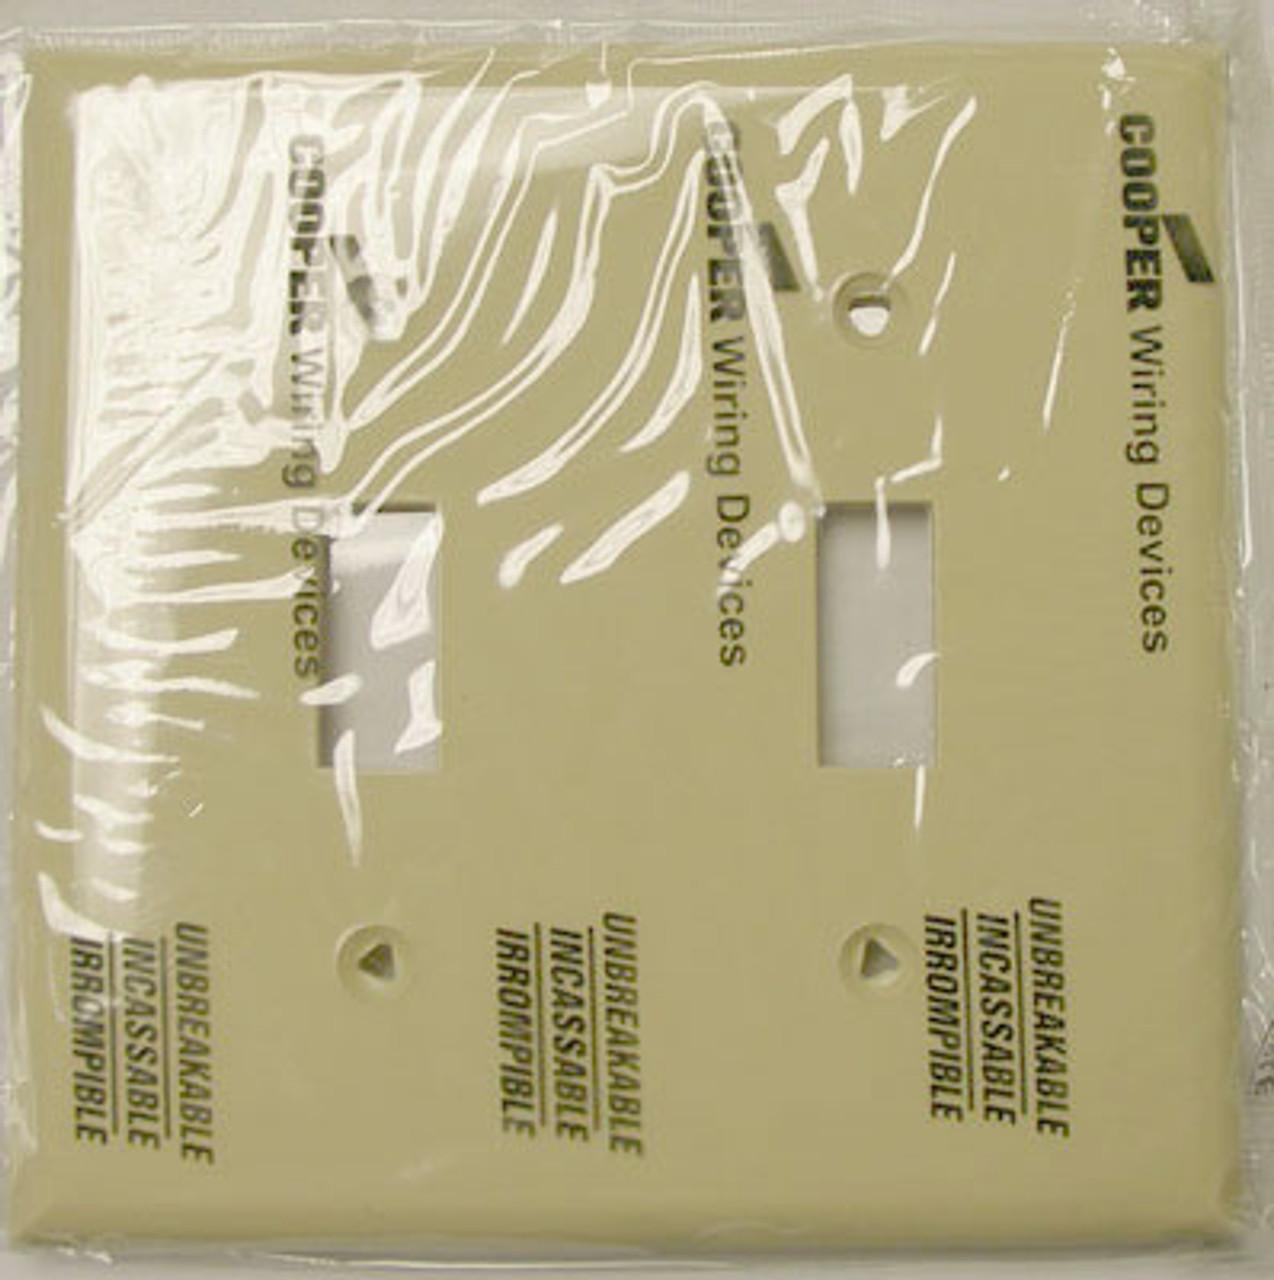 Cooper 5139V 2 Gang Ivory Hosp Switch Plate (Lot of 25) - New